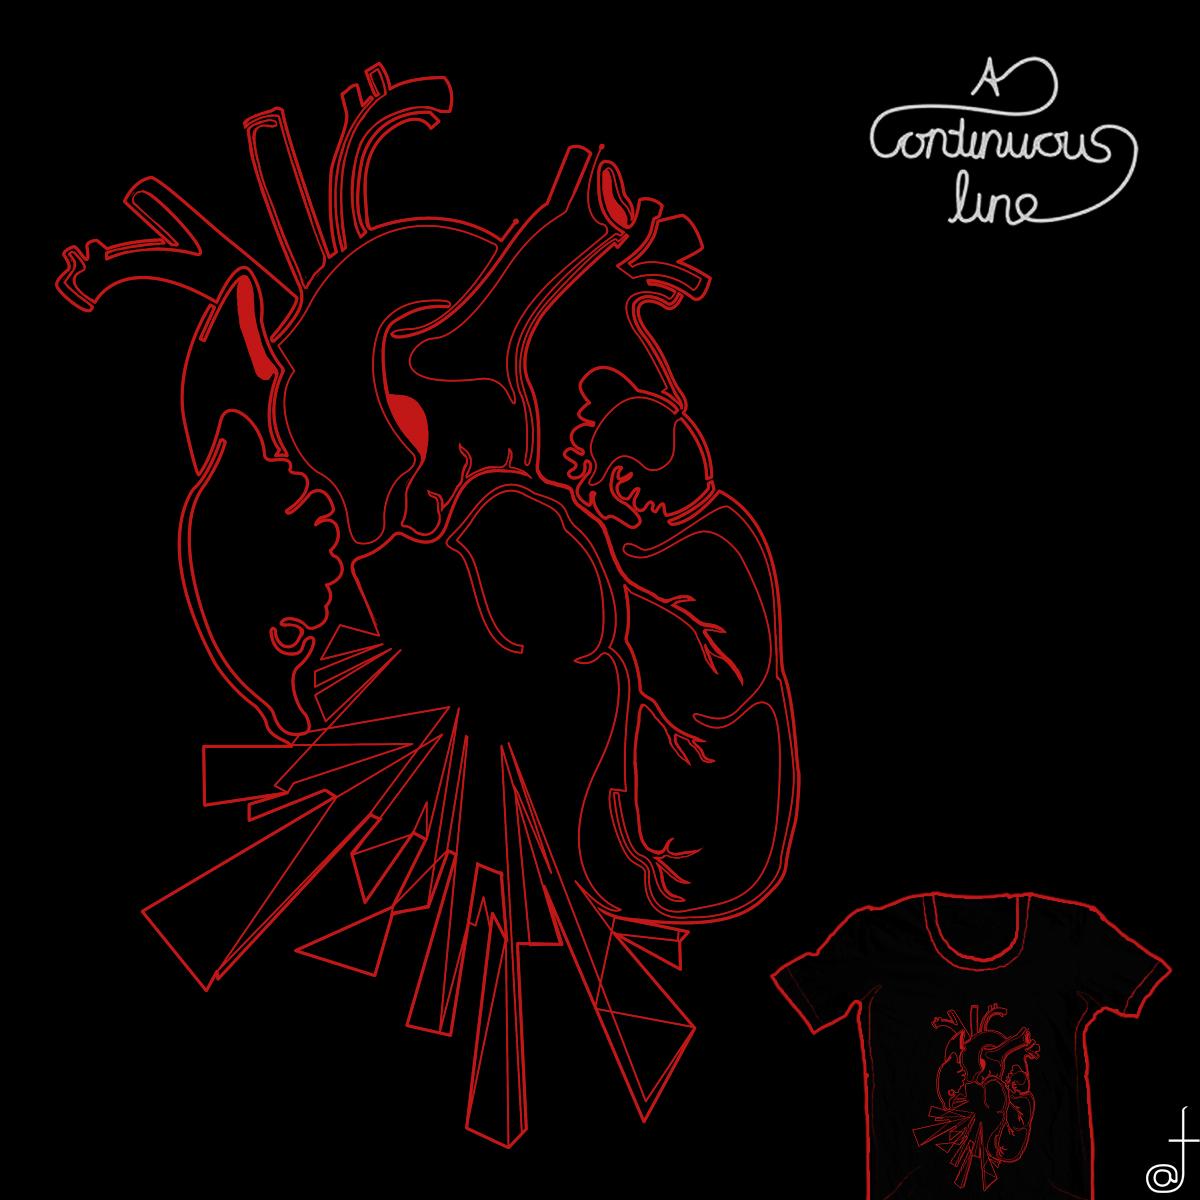 Heart Break by airdeh on Threadless